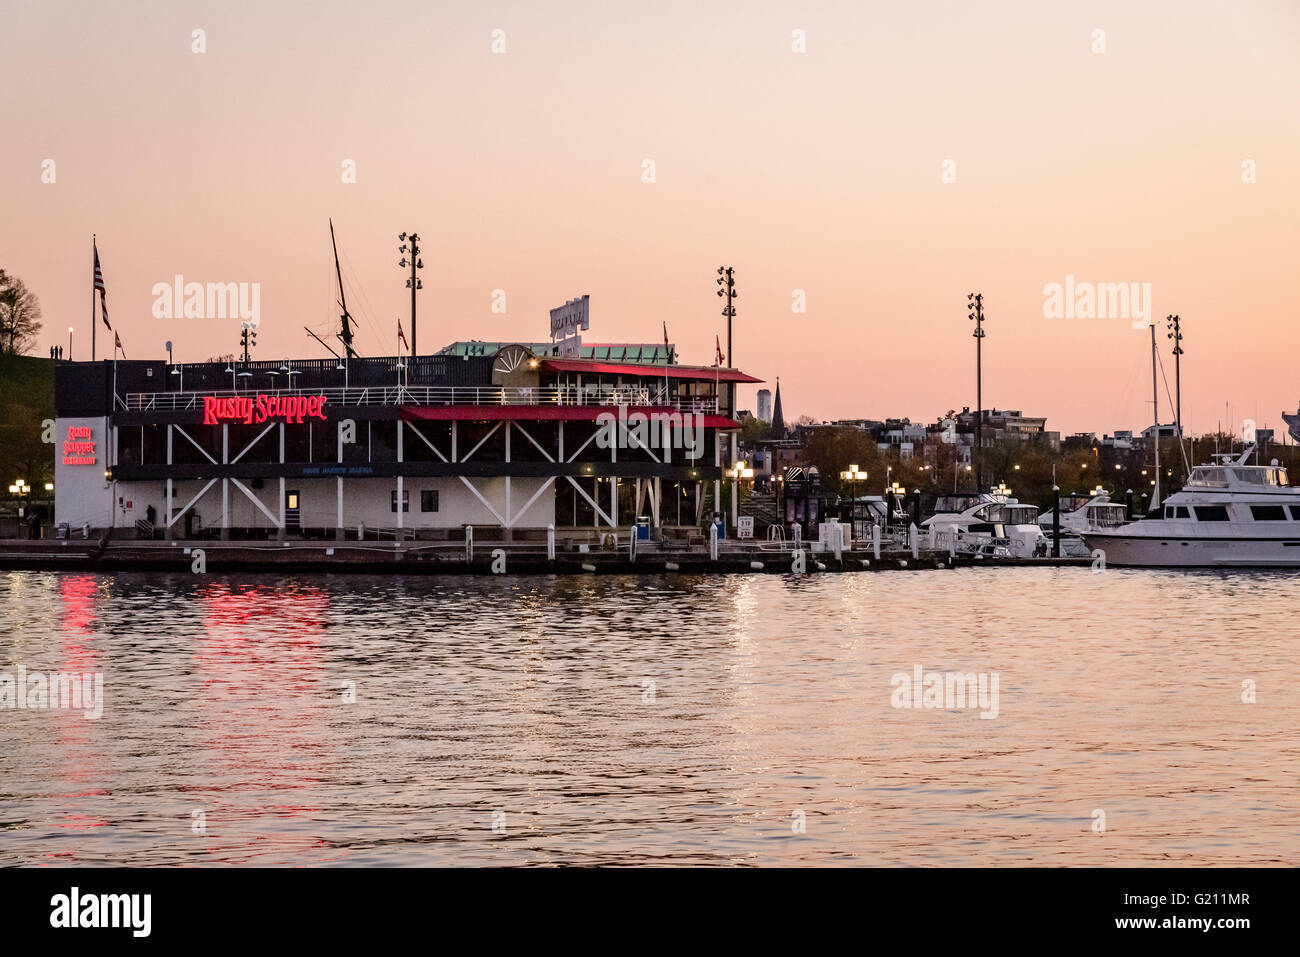 Rusty Scupper Seafood Restaurant Inner Harbor Baltimore